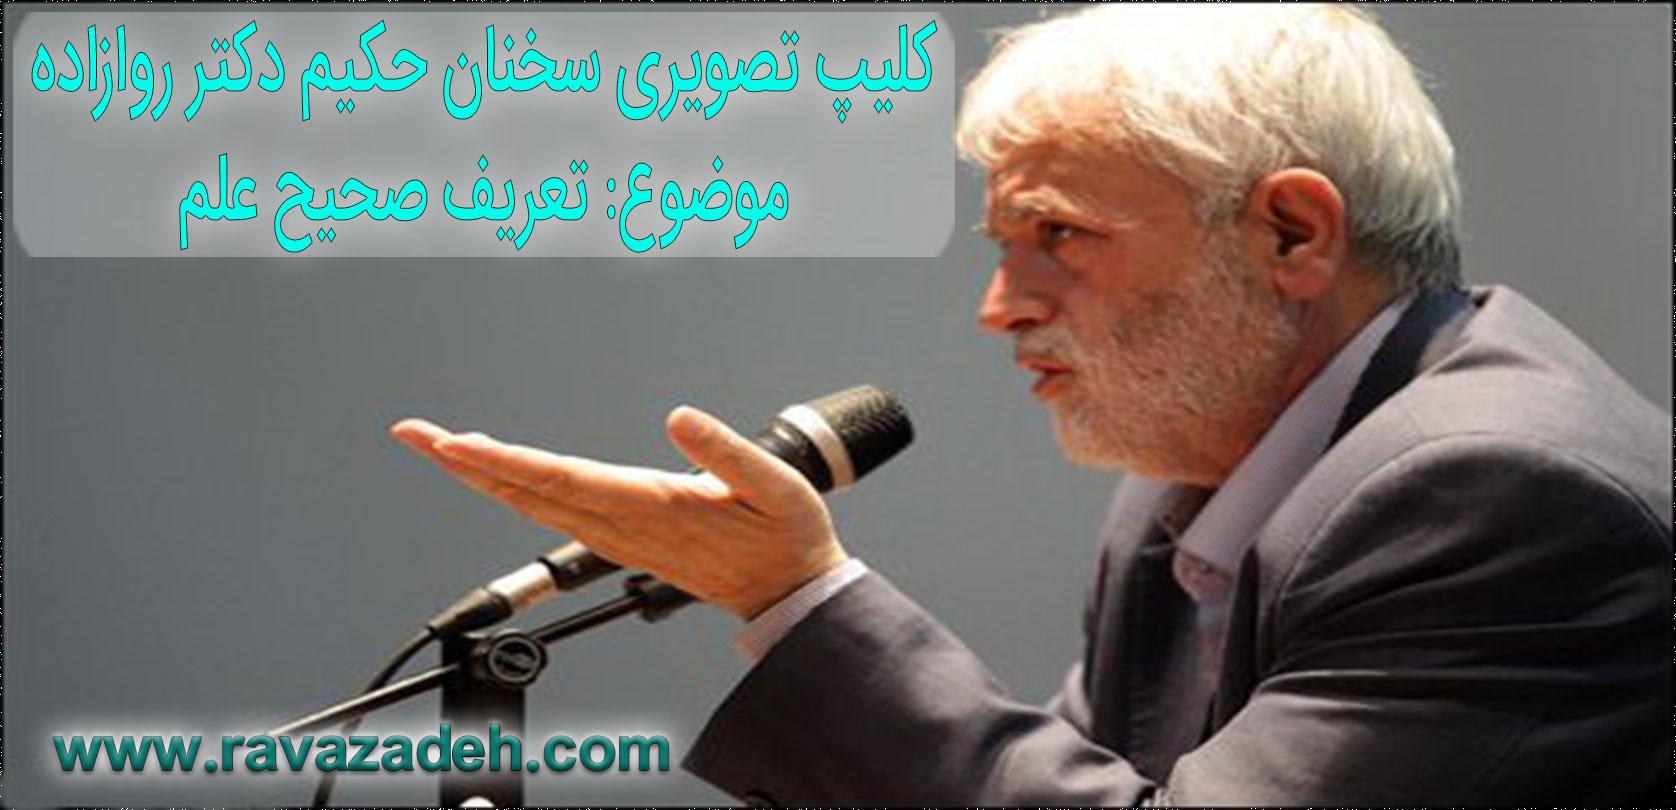 Photo of کلیپ تصویری سخنرانی حکیم دکتر روازاده در خصوص تعریف علم